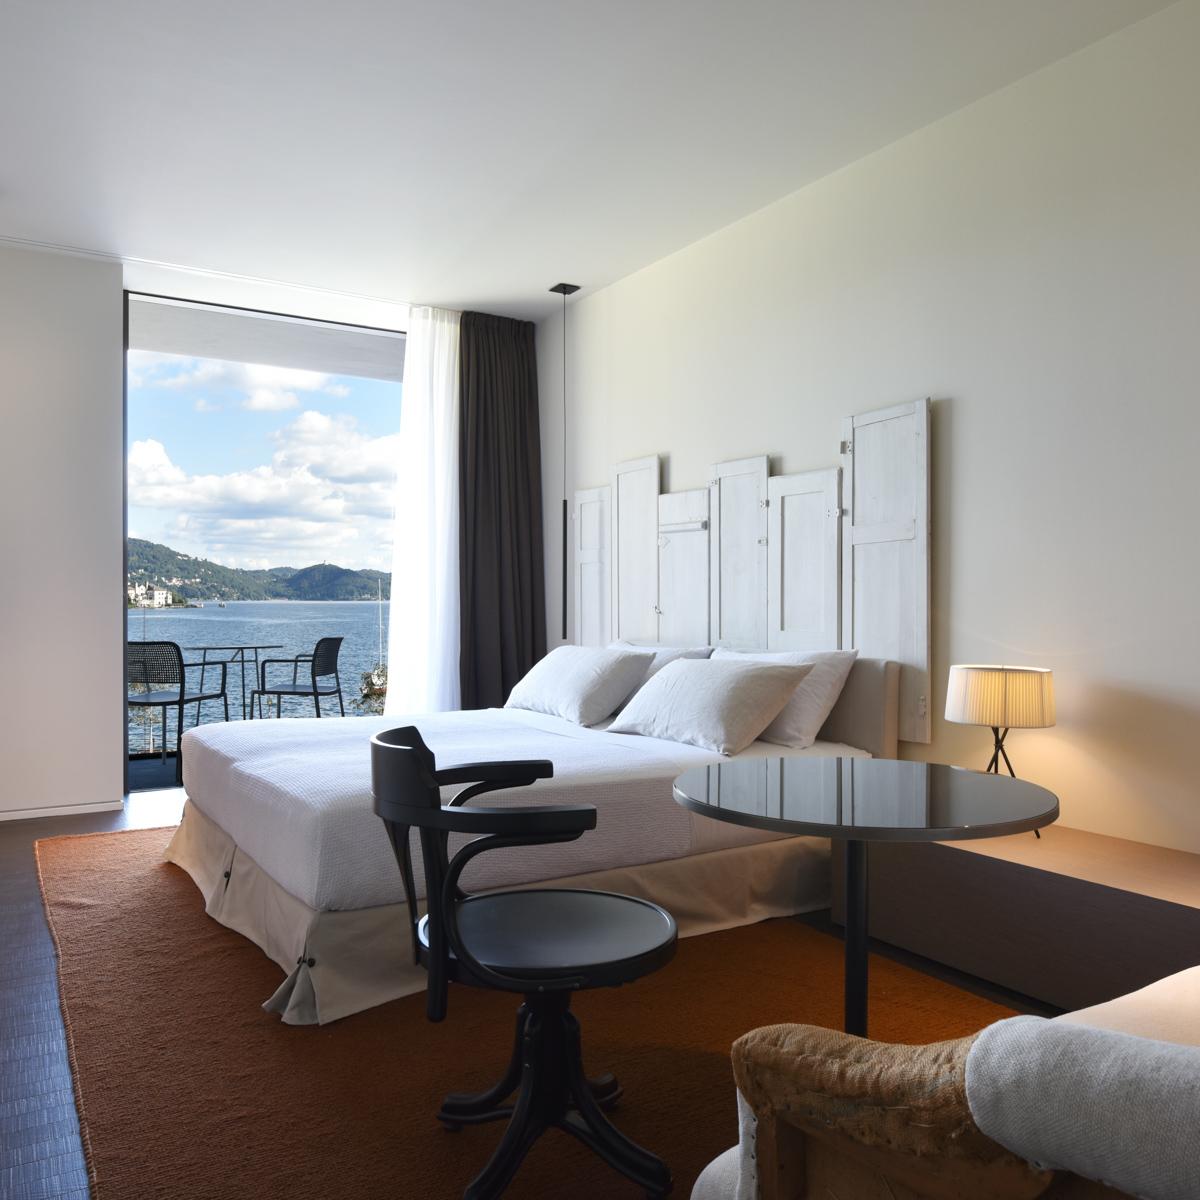 Boutique Hotel Casa Fantini am Lago d'Orta_-5